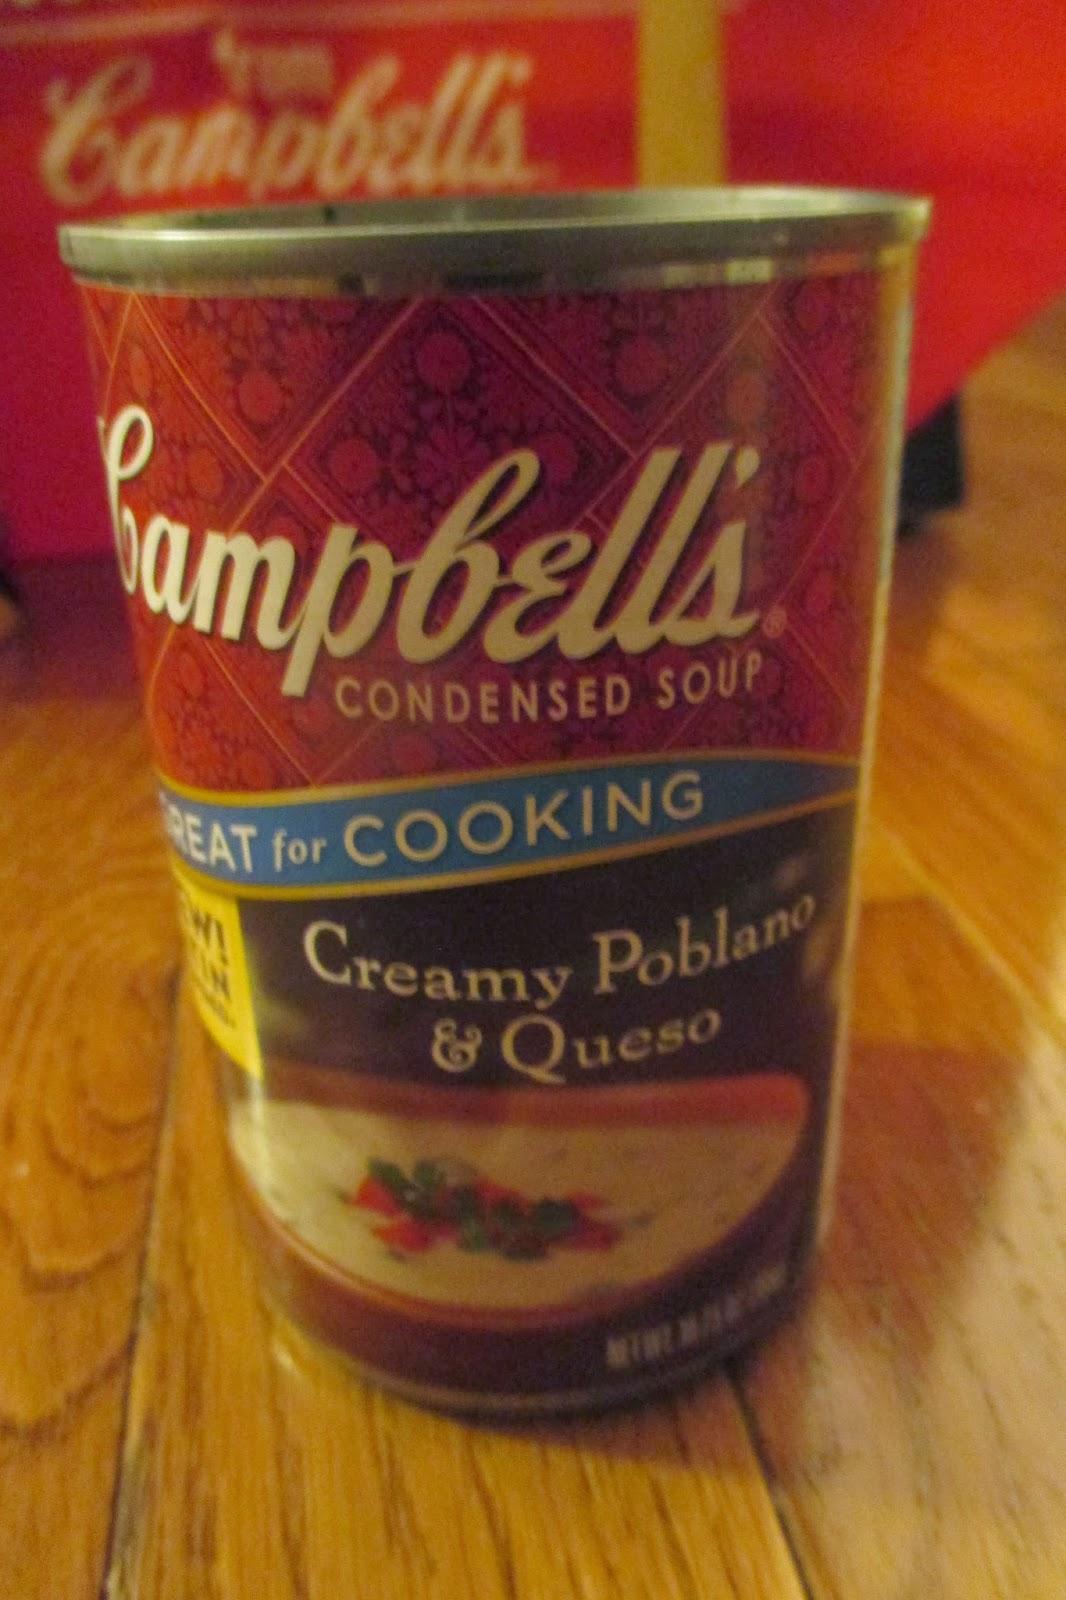 Campbell's Creamy Poblano & Queso soup